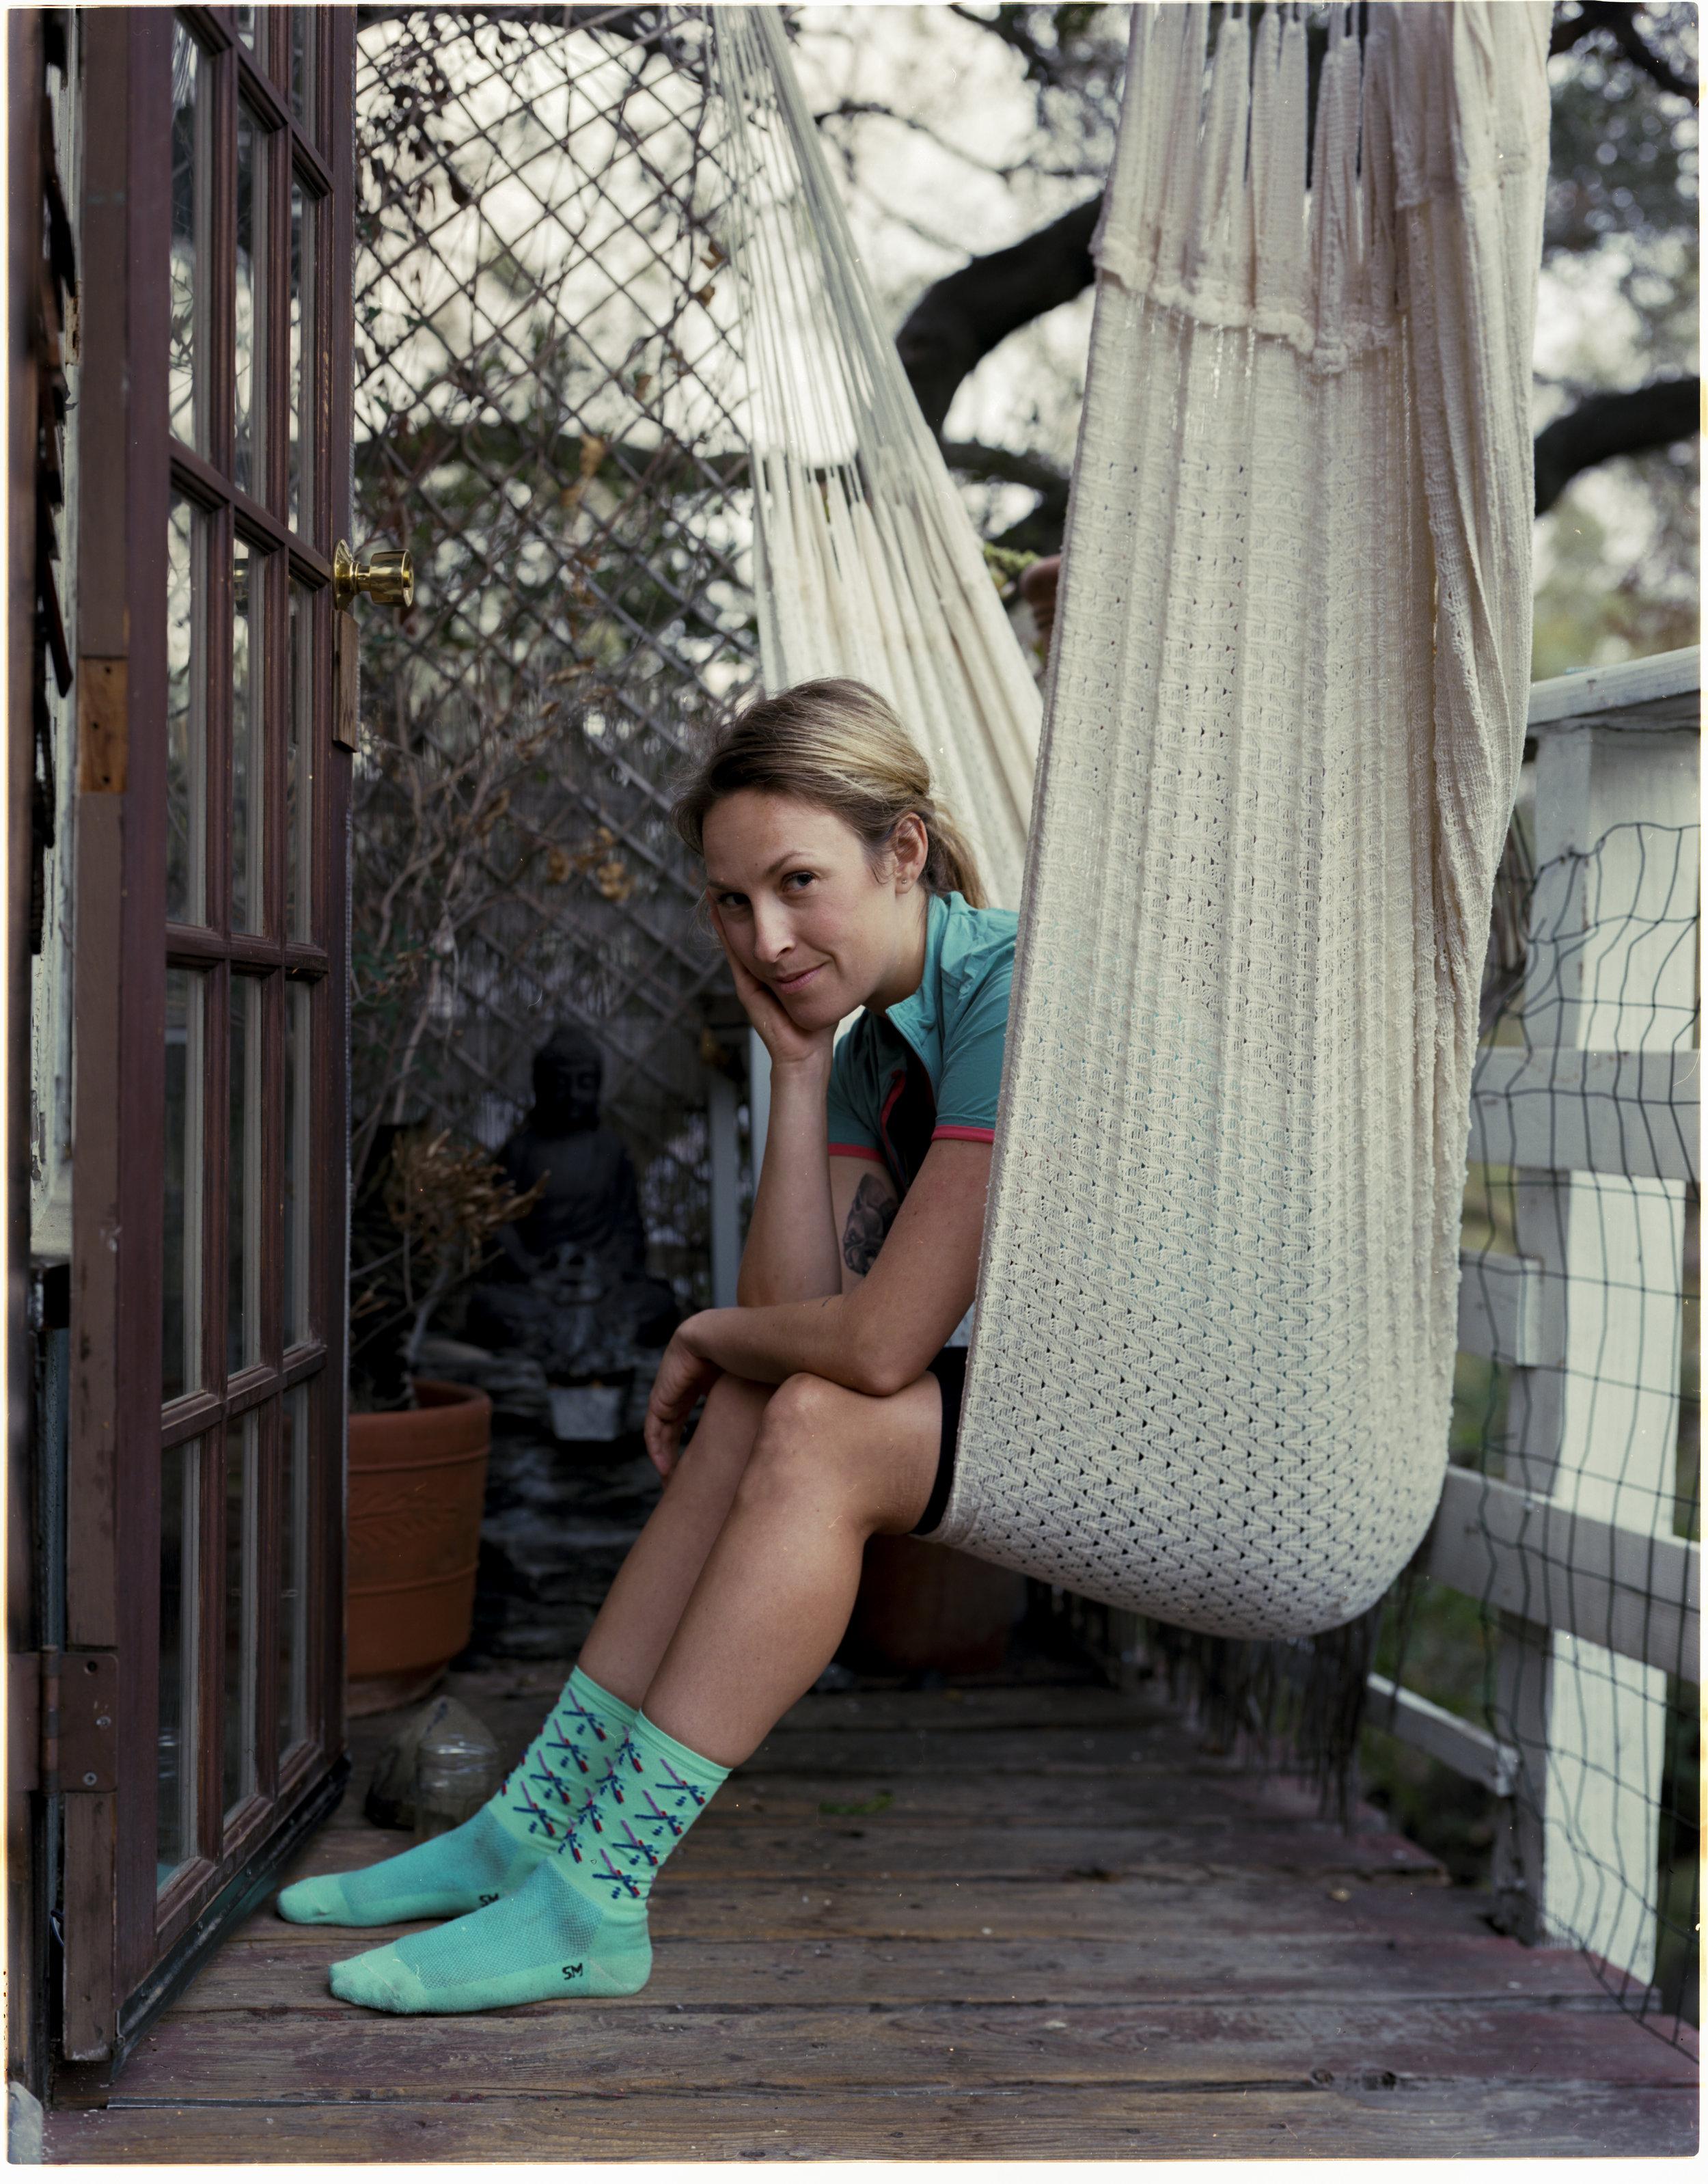 Kelton Wright Photo: Tracy L Chandler